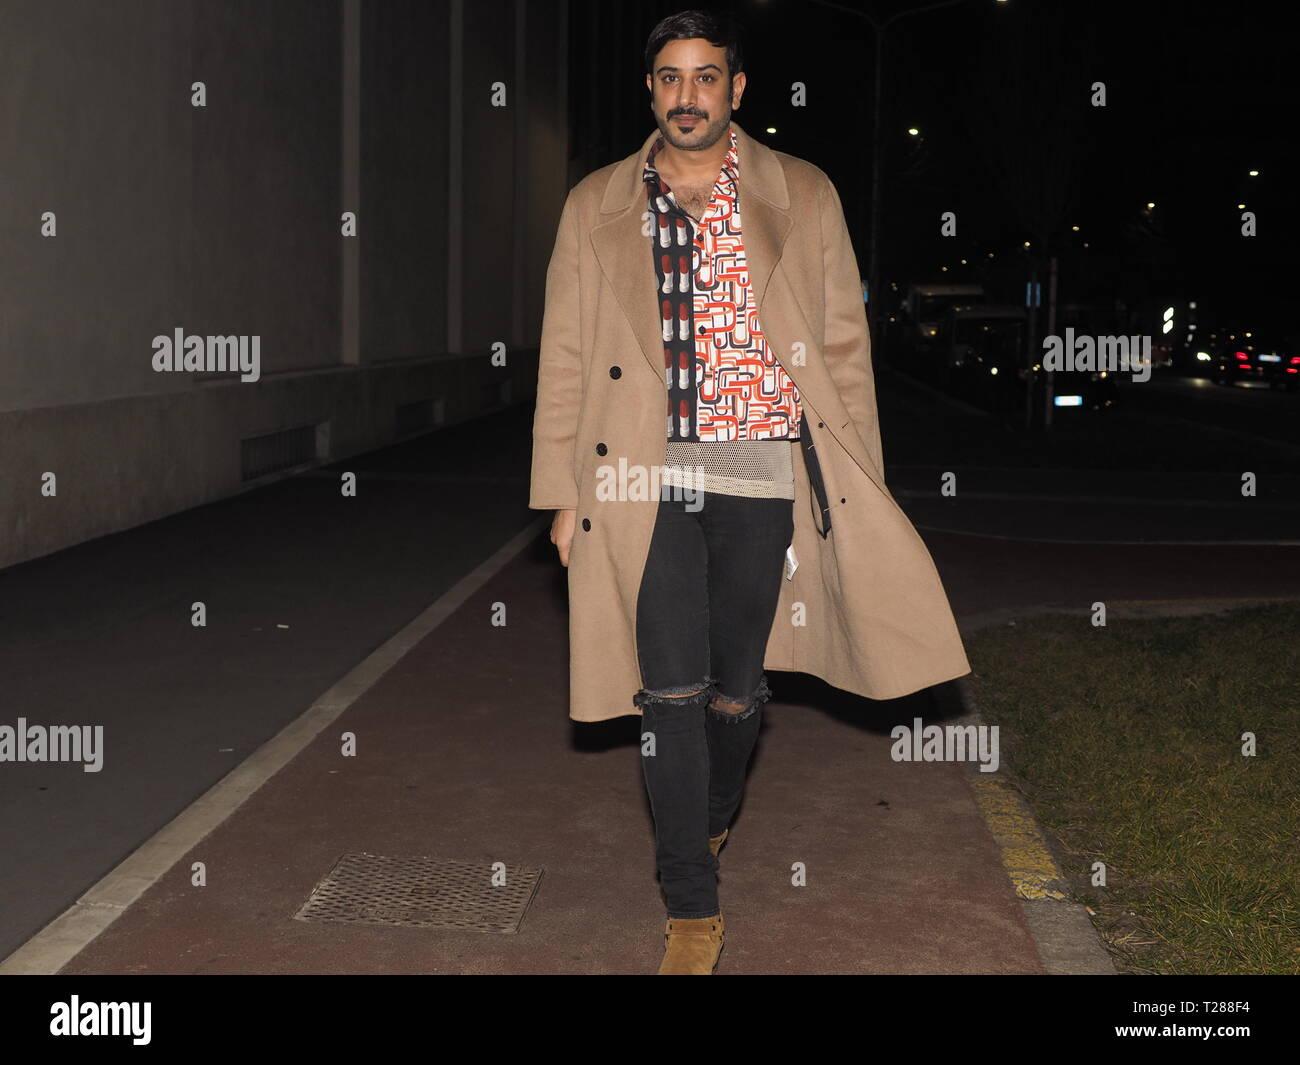 13 Januray 2019 Milan Italy Street Style Outfits Before Prada Fashion Show During Mfw 2019 Man Fall Winter Stock Photo Alamy